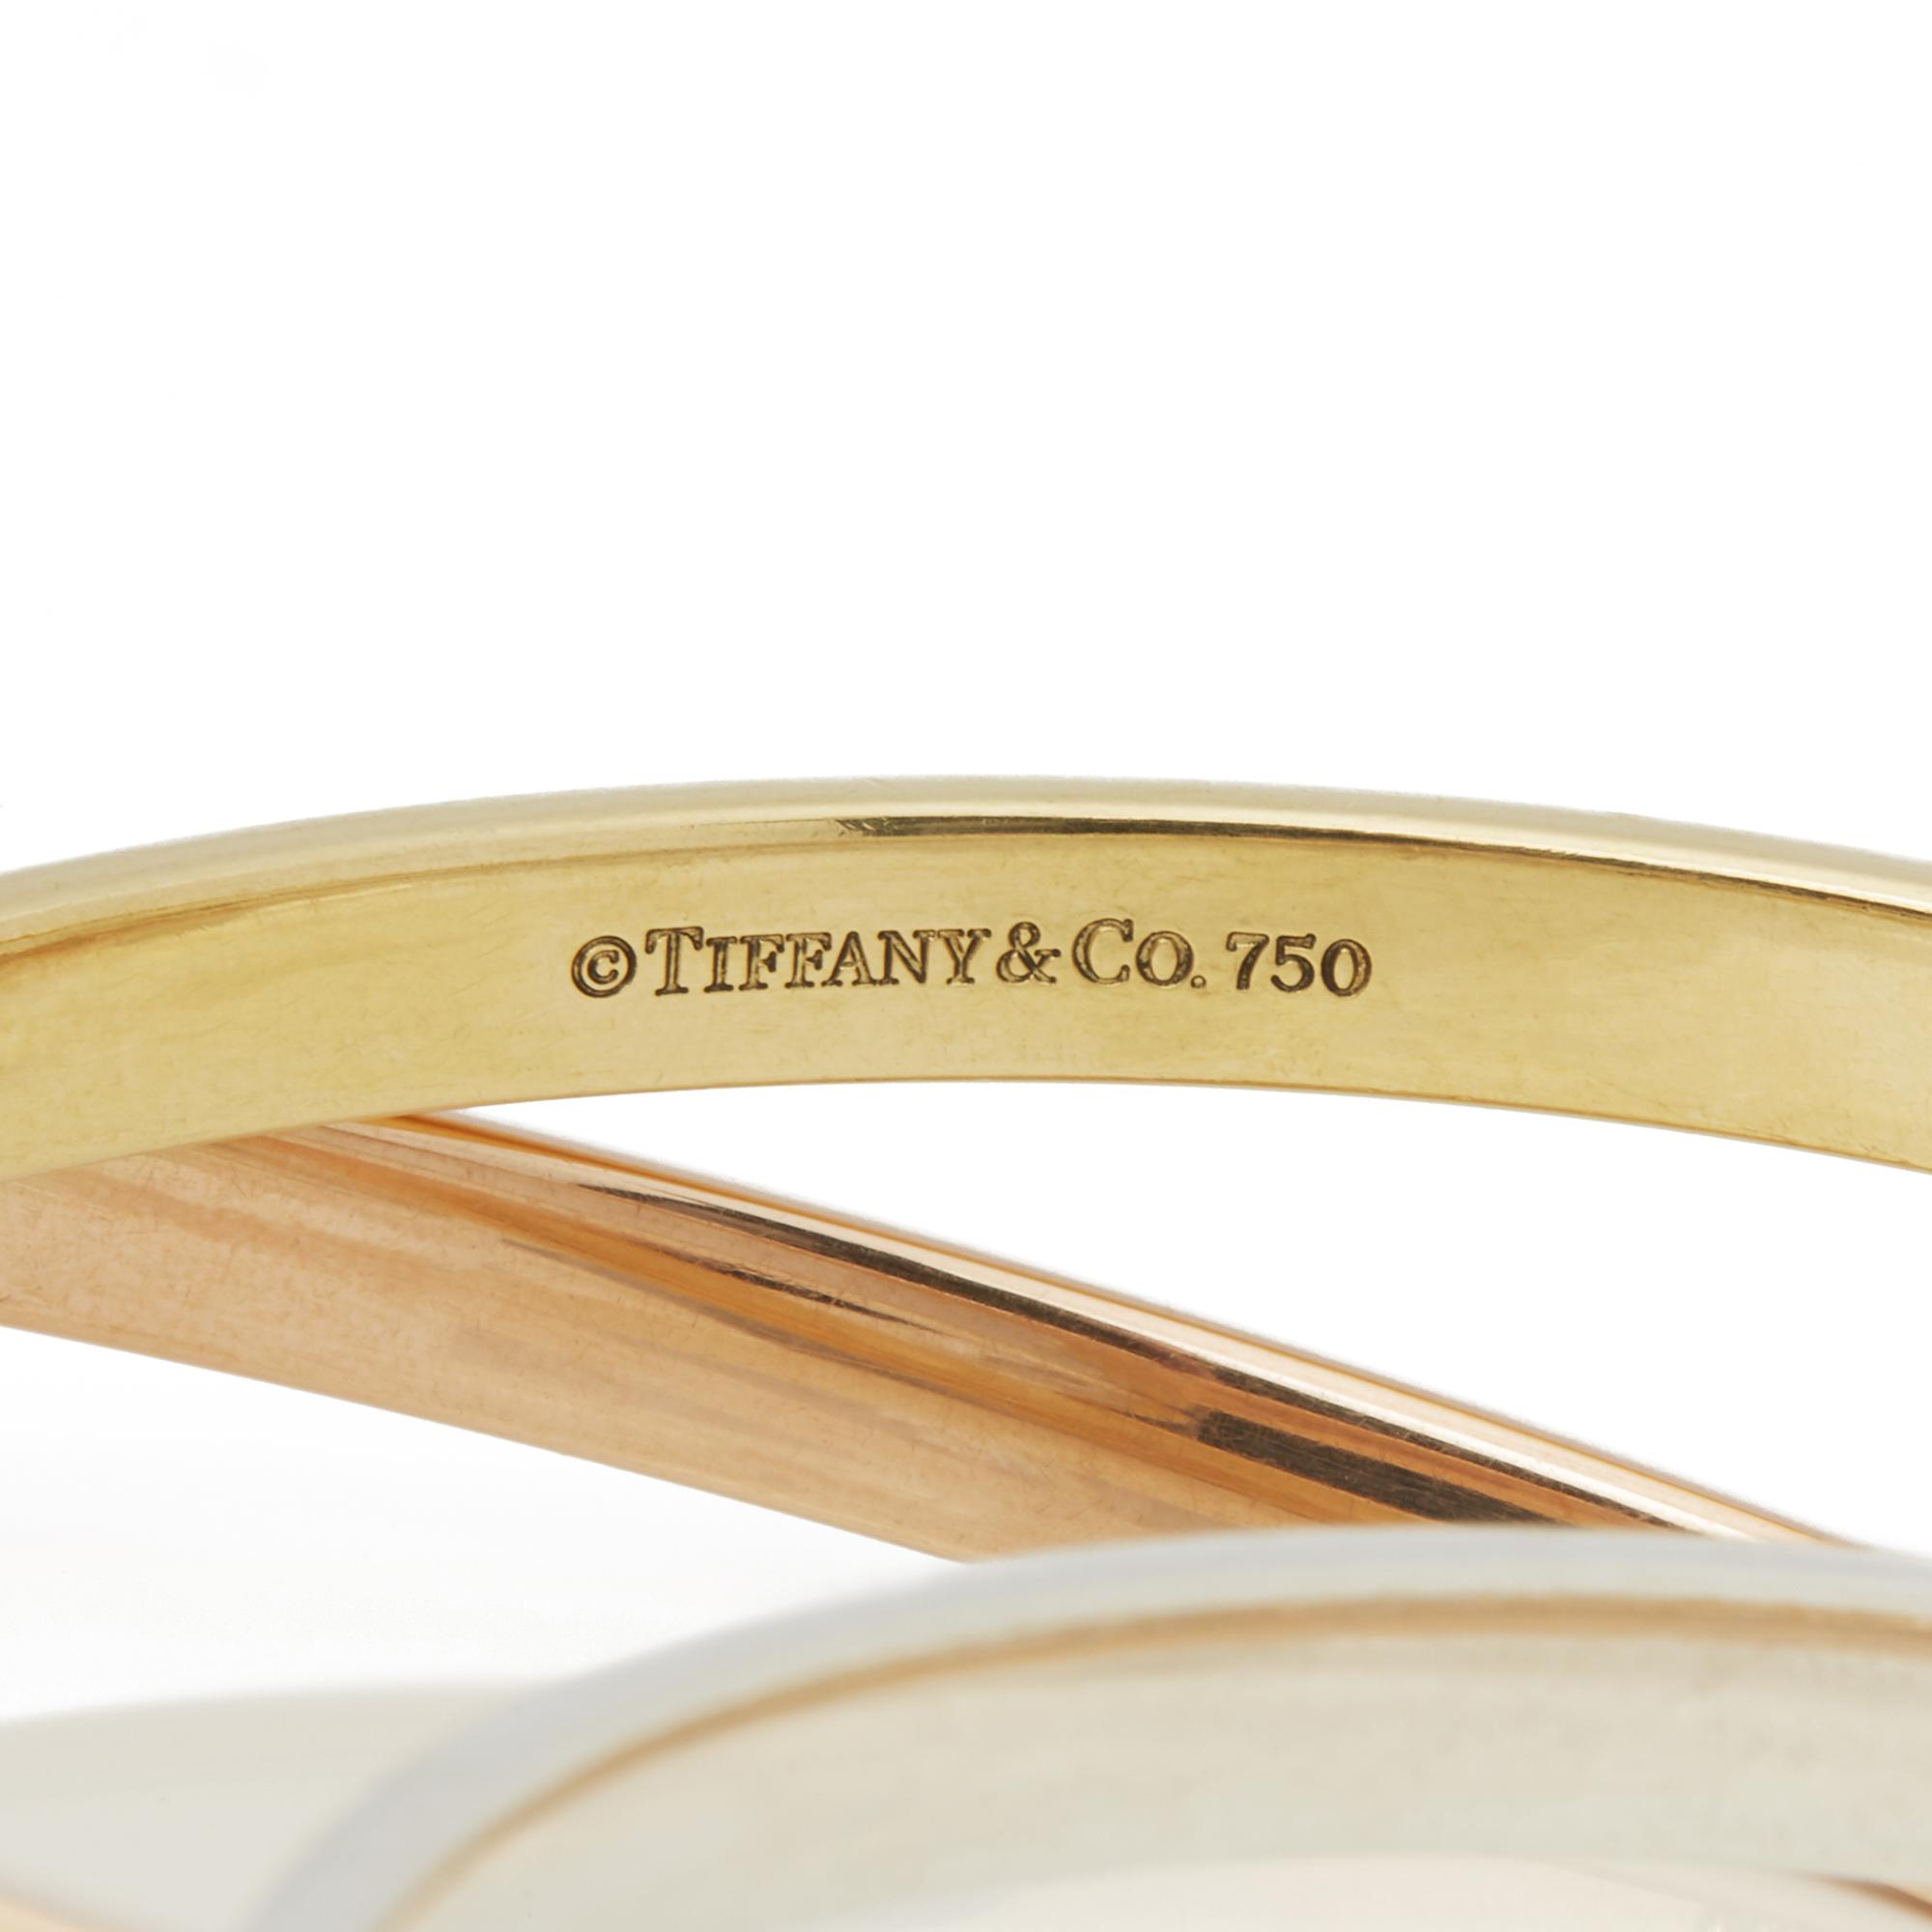 Lot 30 - 18k Yellow, Rose Gold & Silver 1837 Bracelet